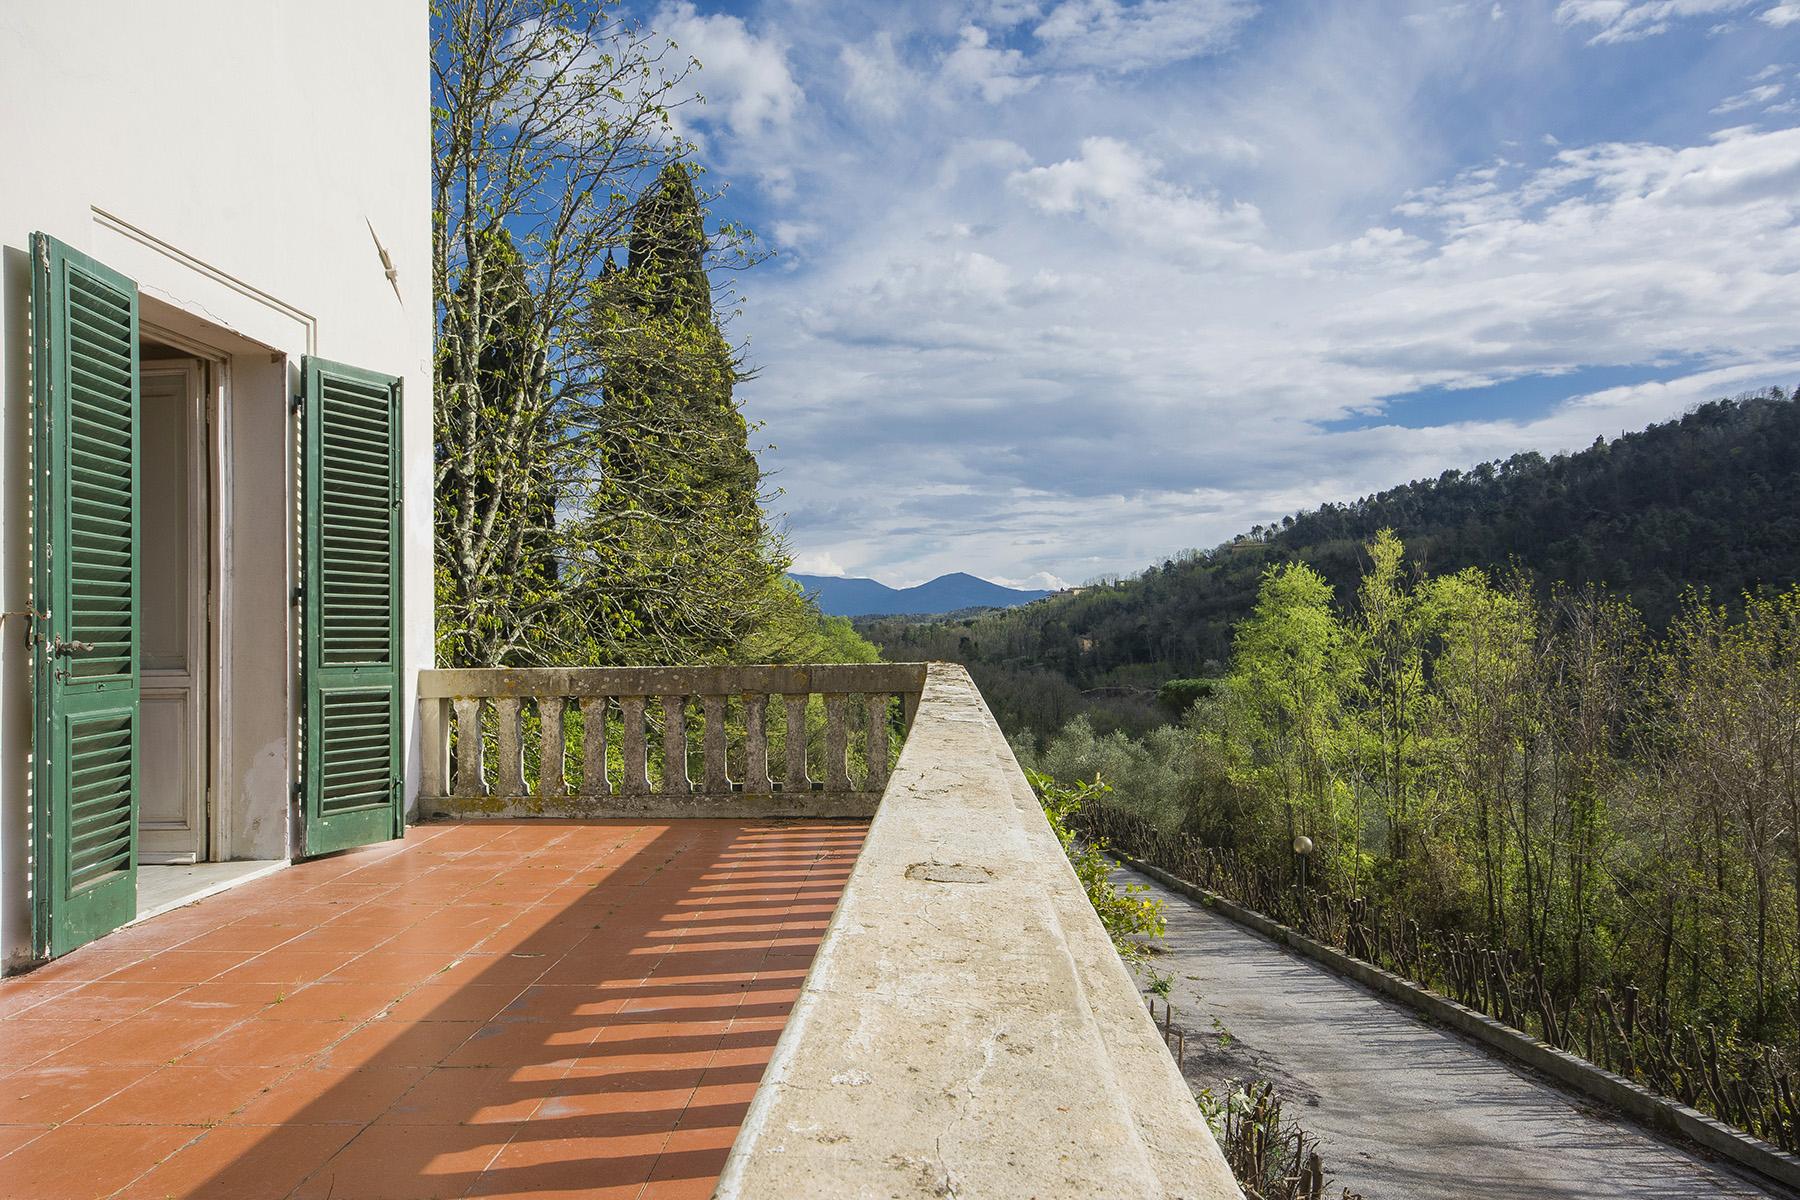 Villa in Vendita a Lucca: 5 locali, 700 mq - Foto 8